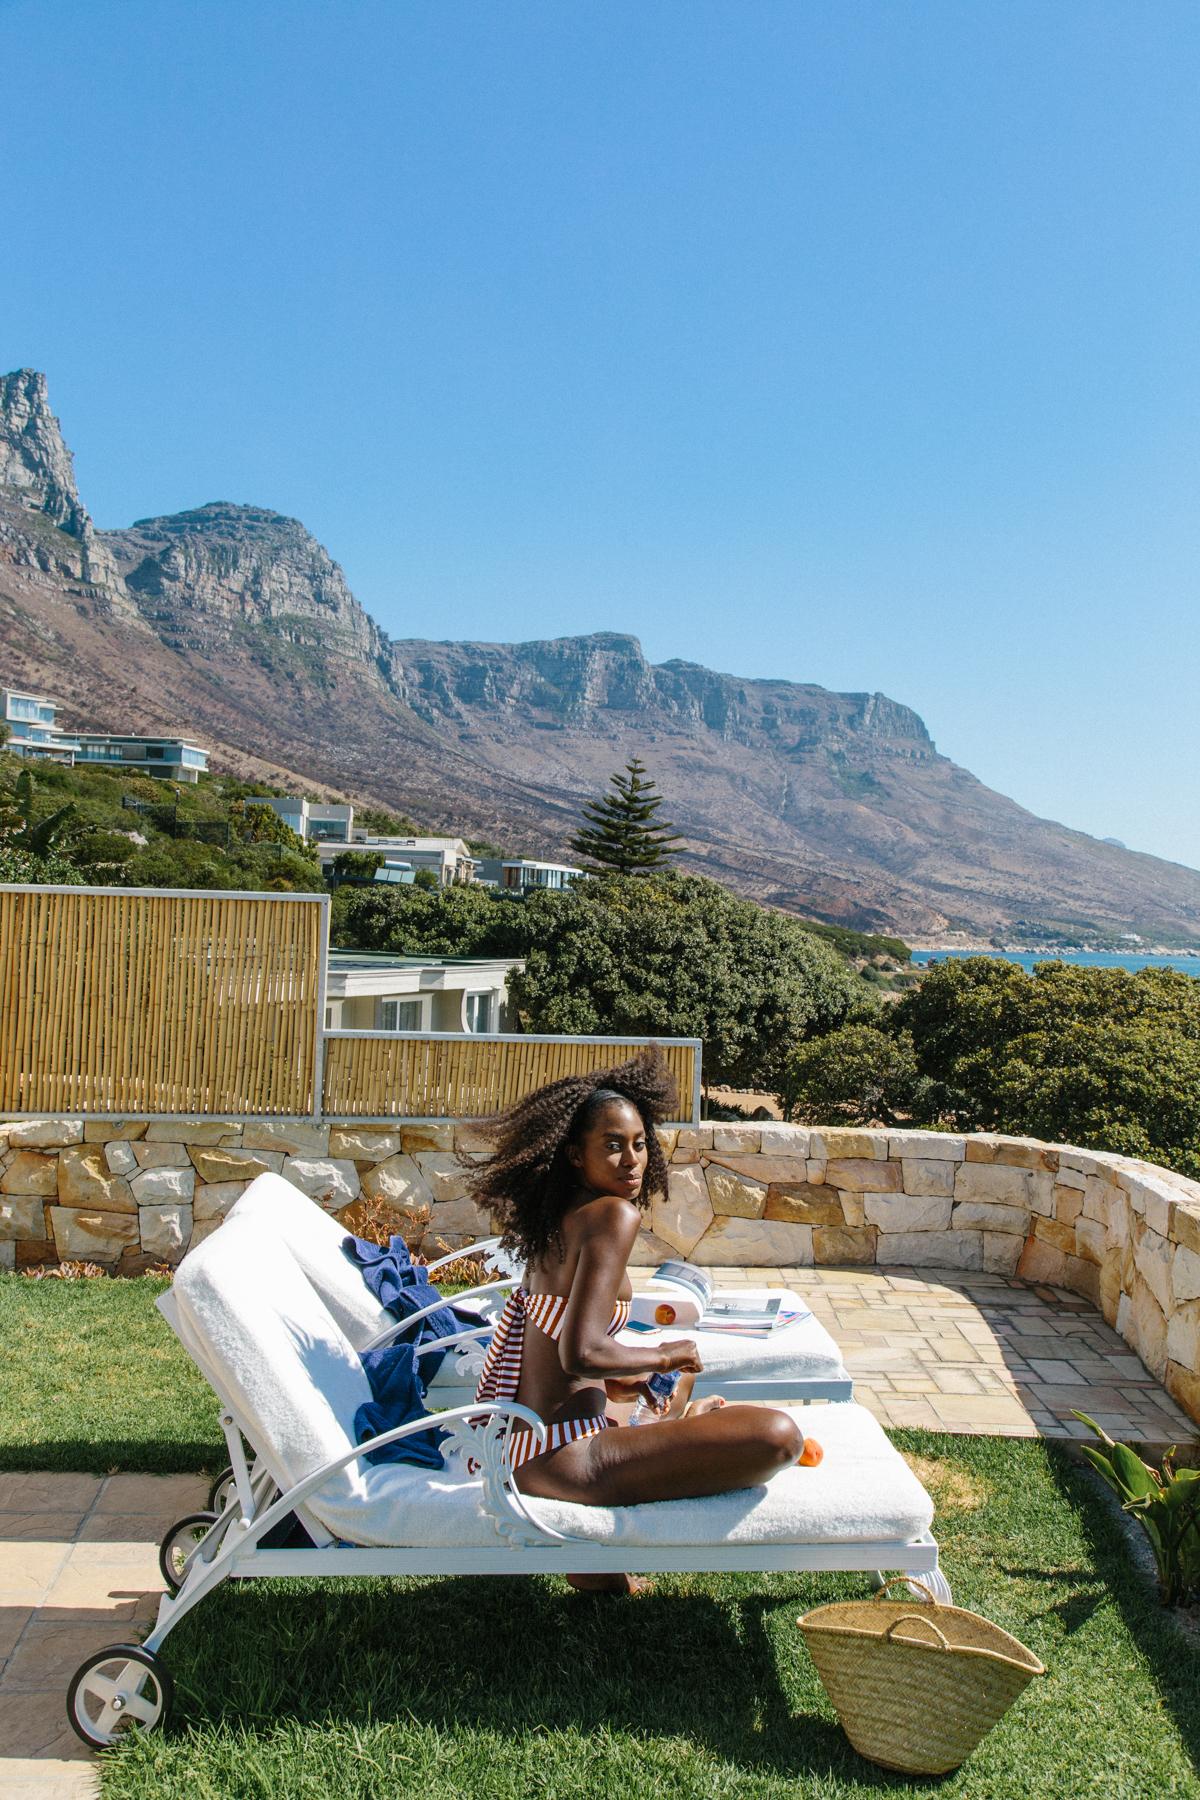 Spiritedpursuit_leelitumbe_capetown_southafrica-9-69.jpg